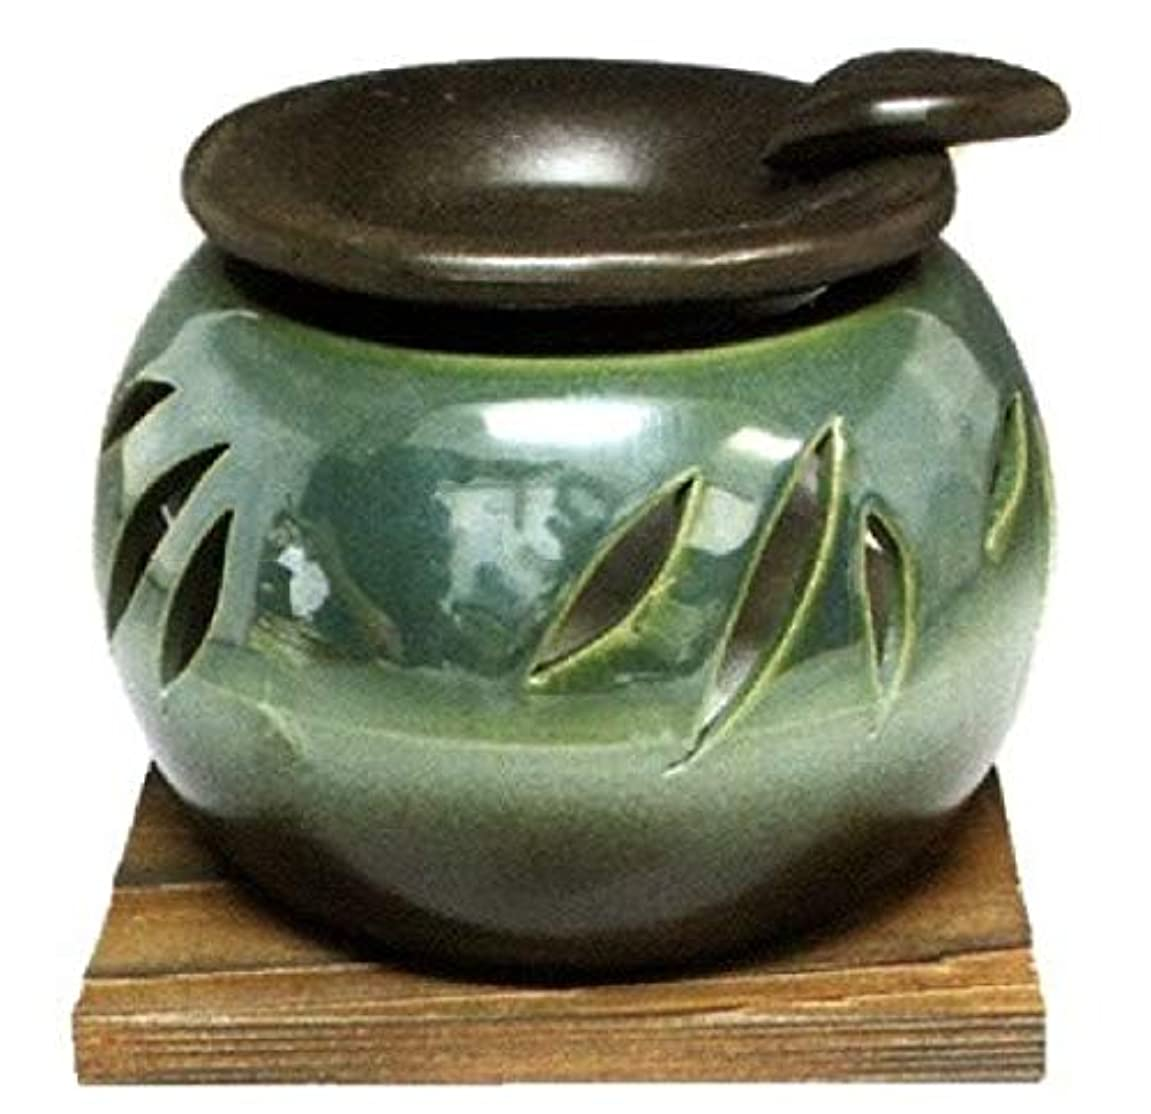 受信機混雑難しい常滑焼?山房窯 カ40-10 茶香炉 杉板付 約φ11.3×8.4cm